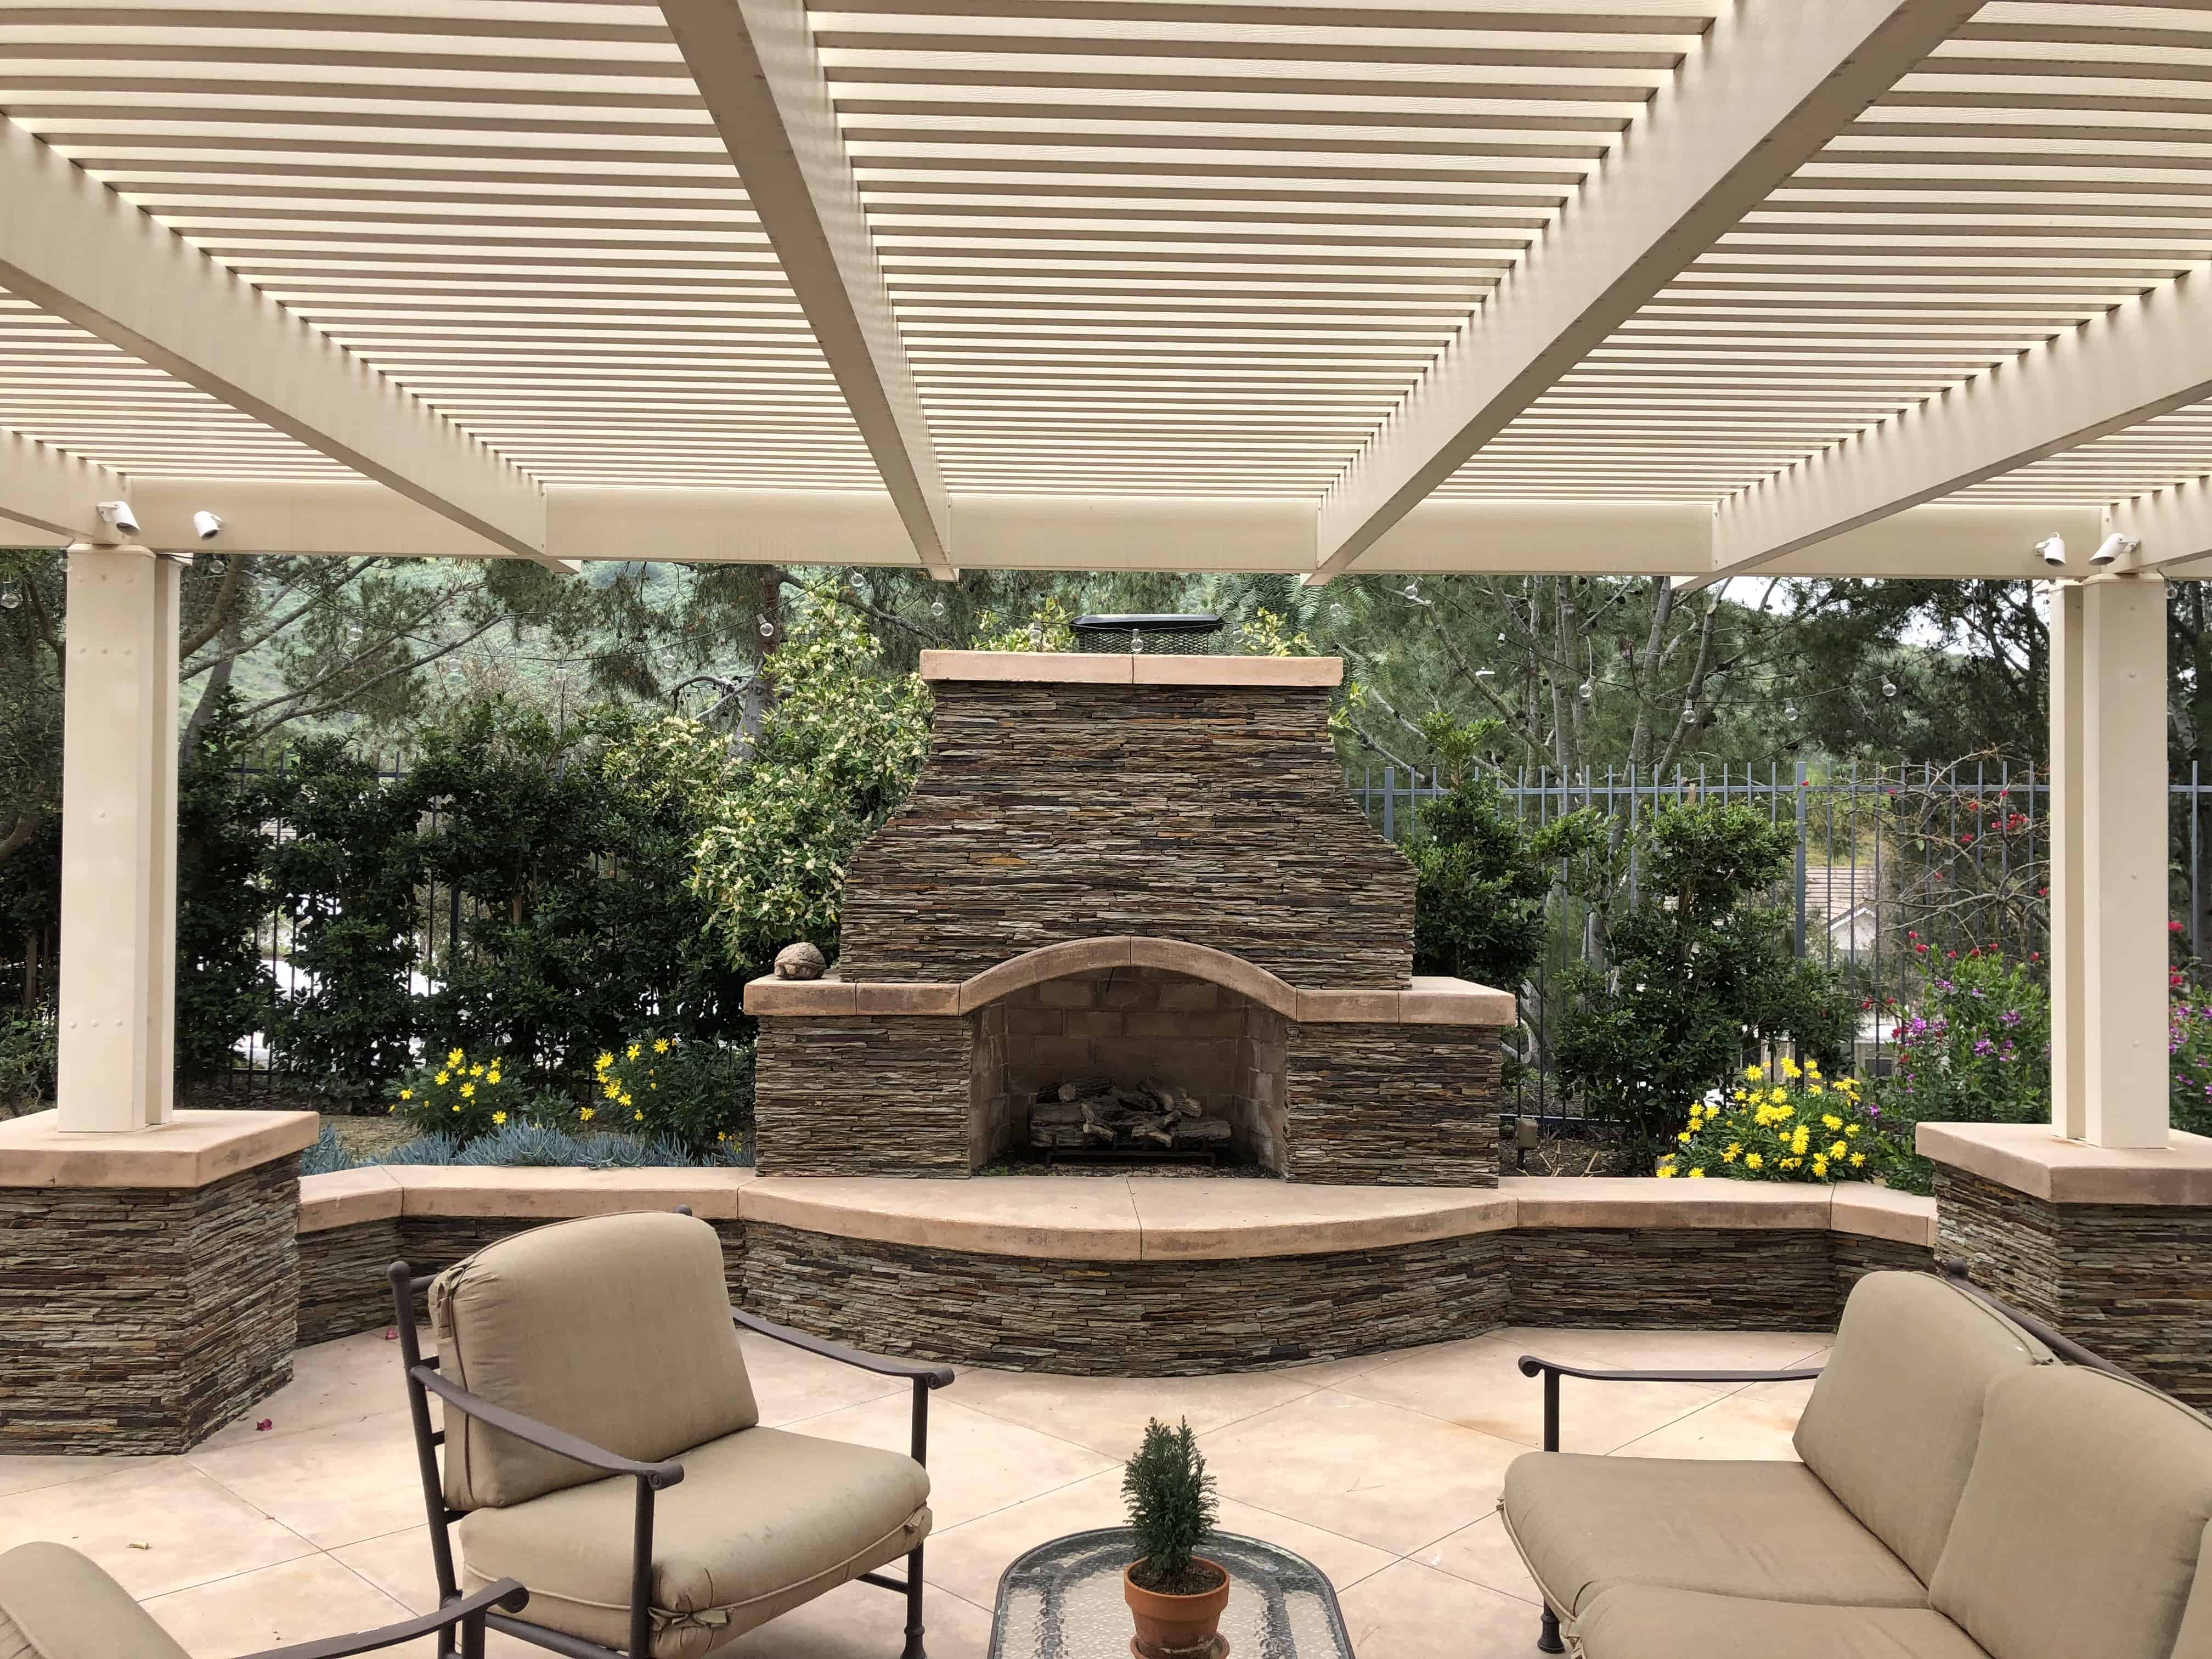 maxxwood alumawood patio cover